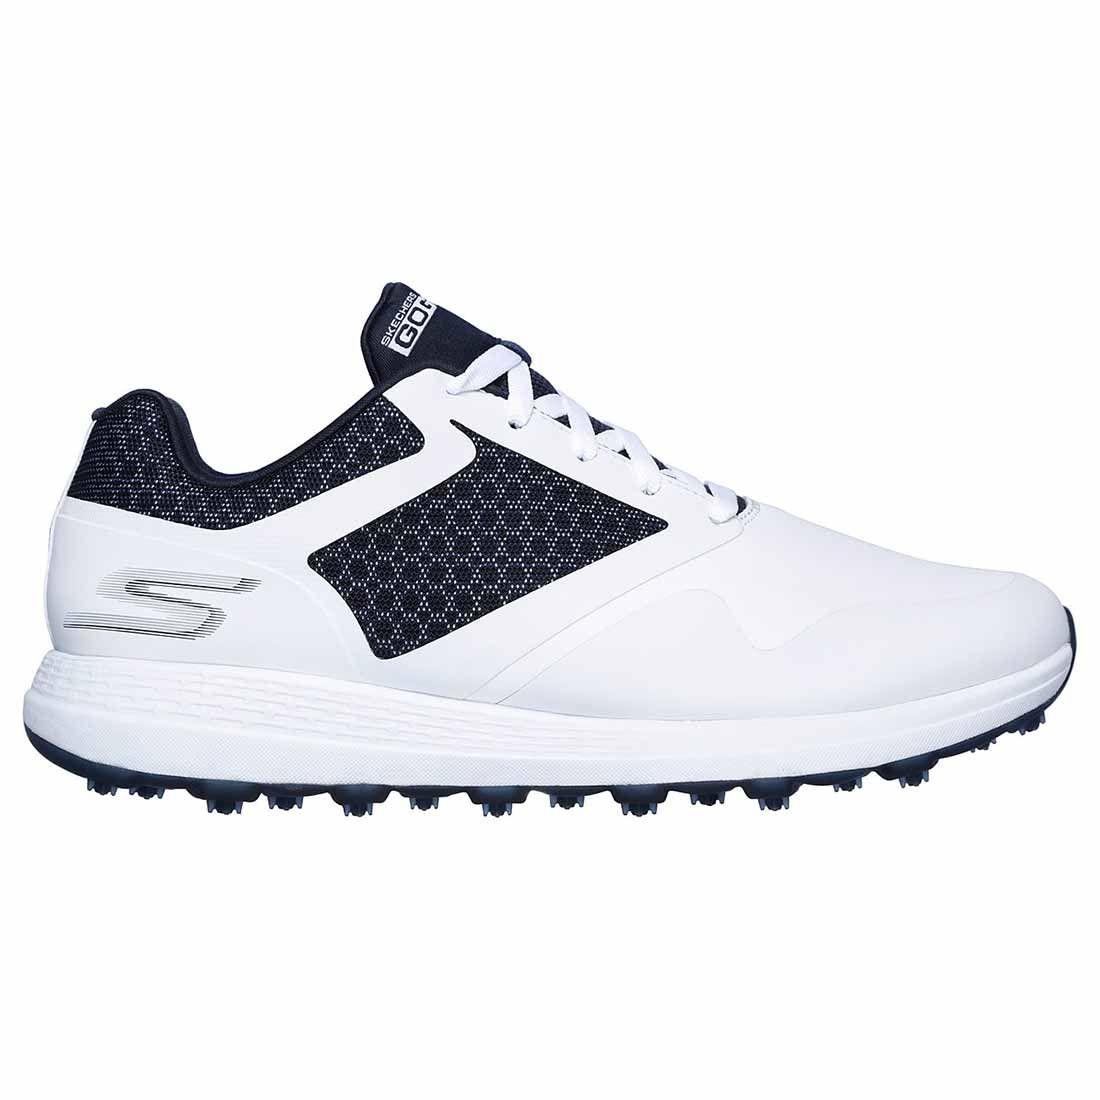 Buy Skechers GO GOLF Max Golf Shoes